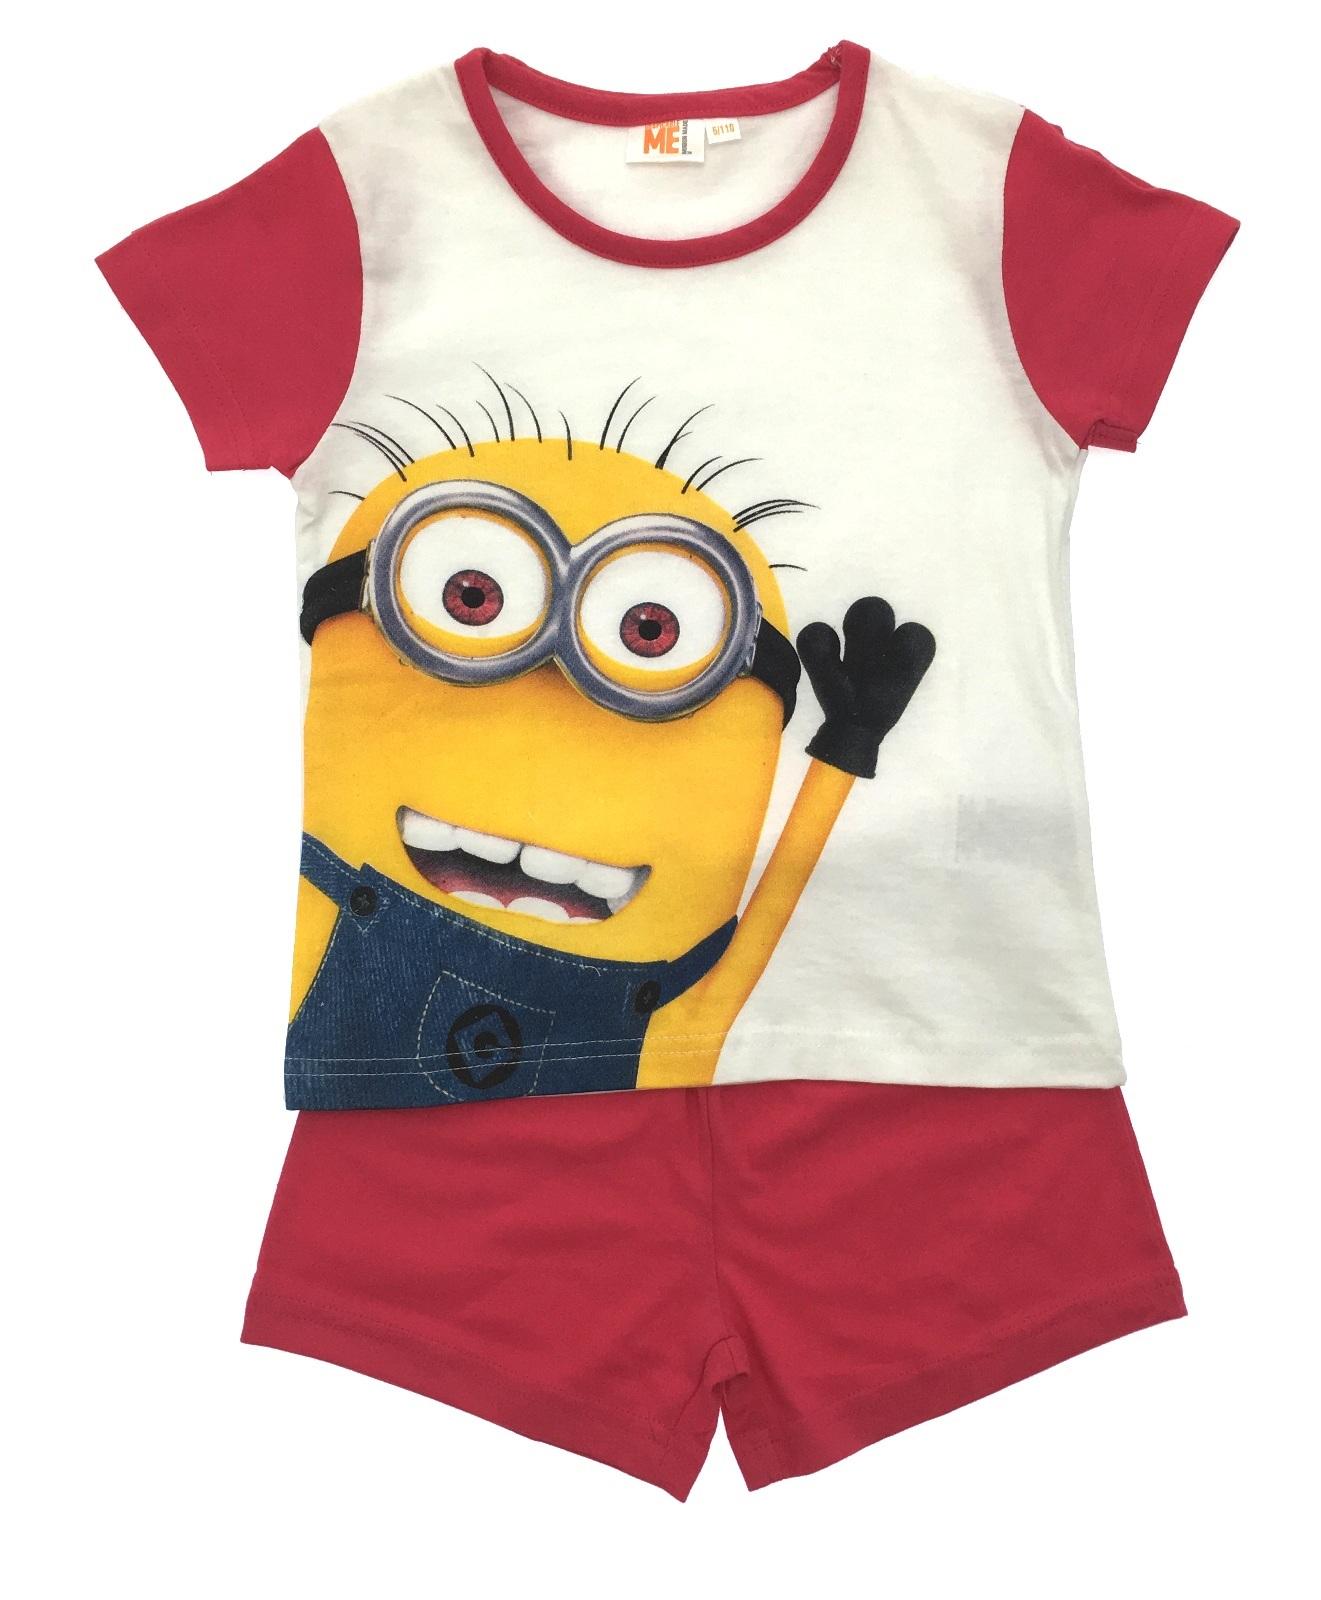 Girls Short Pyjama Set Despicable Me Minions Short Pjs Set Kids ... 908614b19